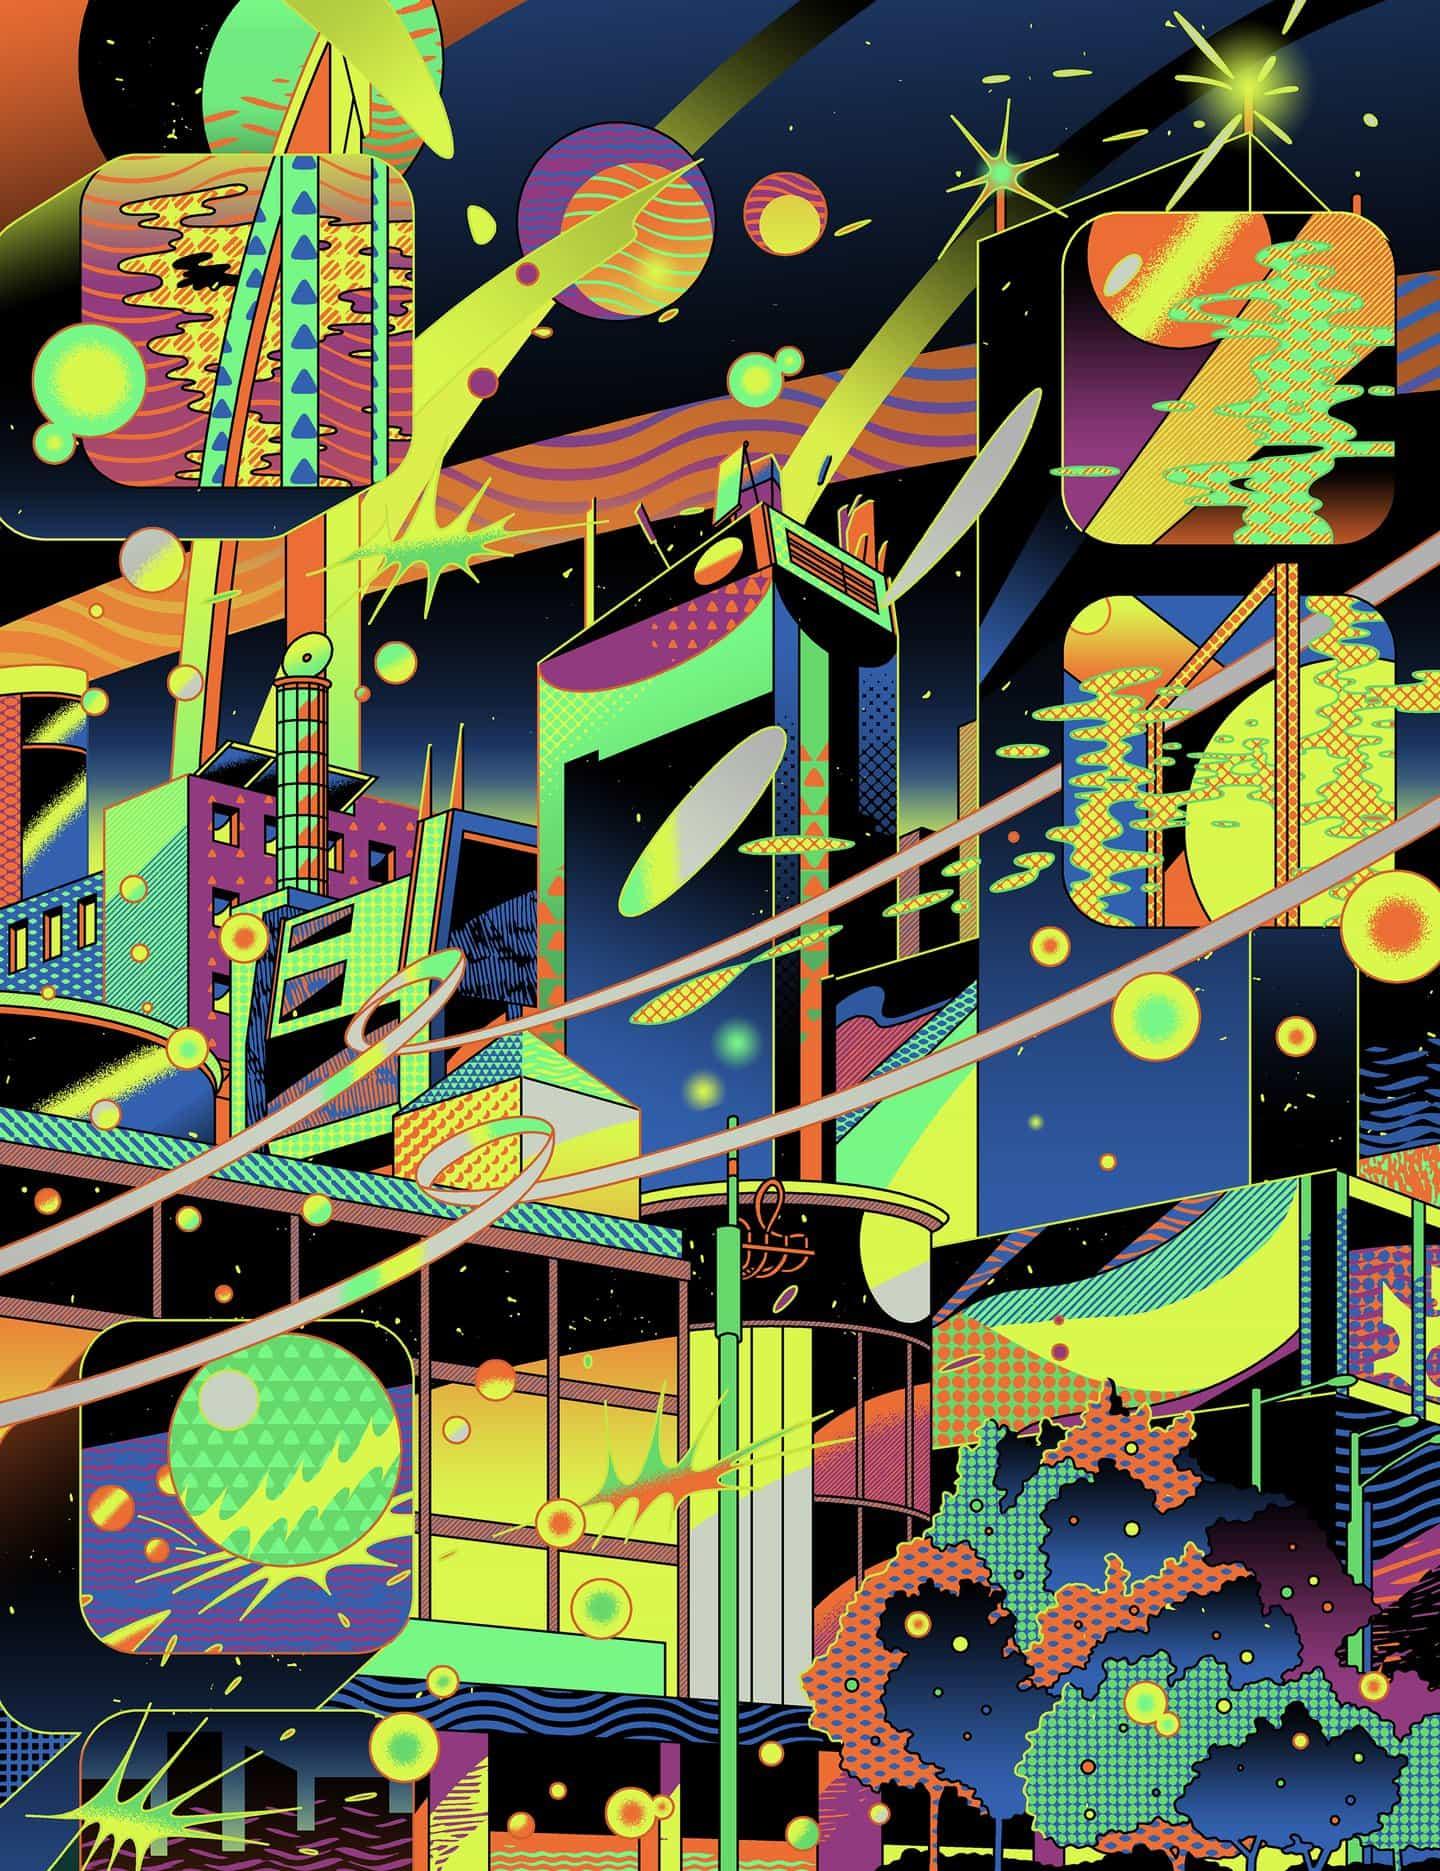 Jinhwa Jang dibuja figuras abstractas, paisajes de neón y futuros distópicos